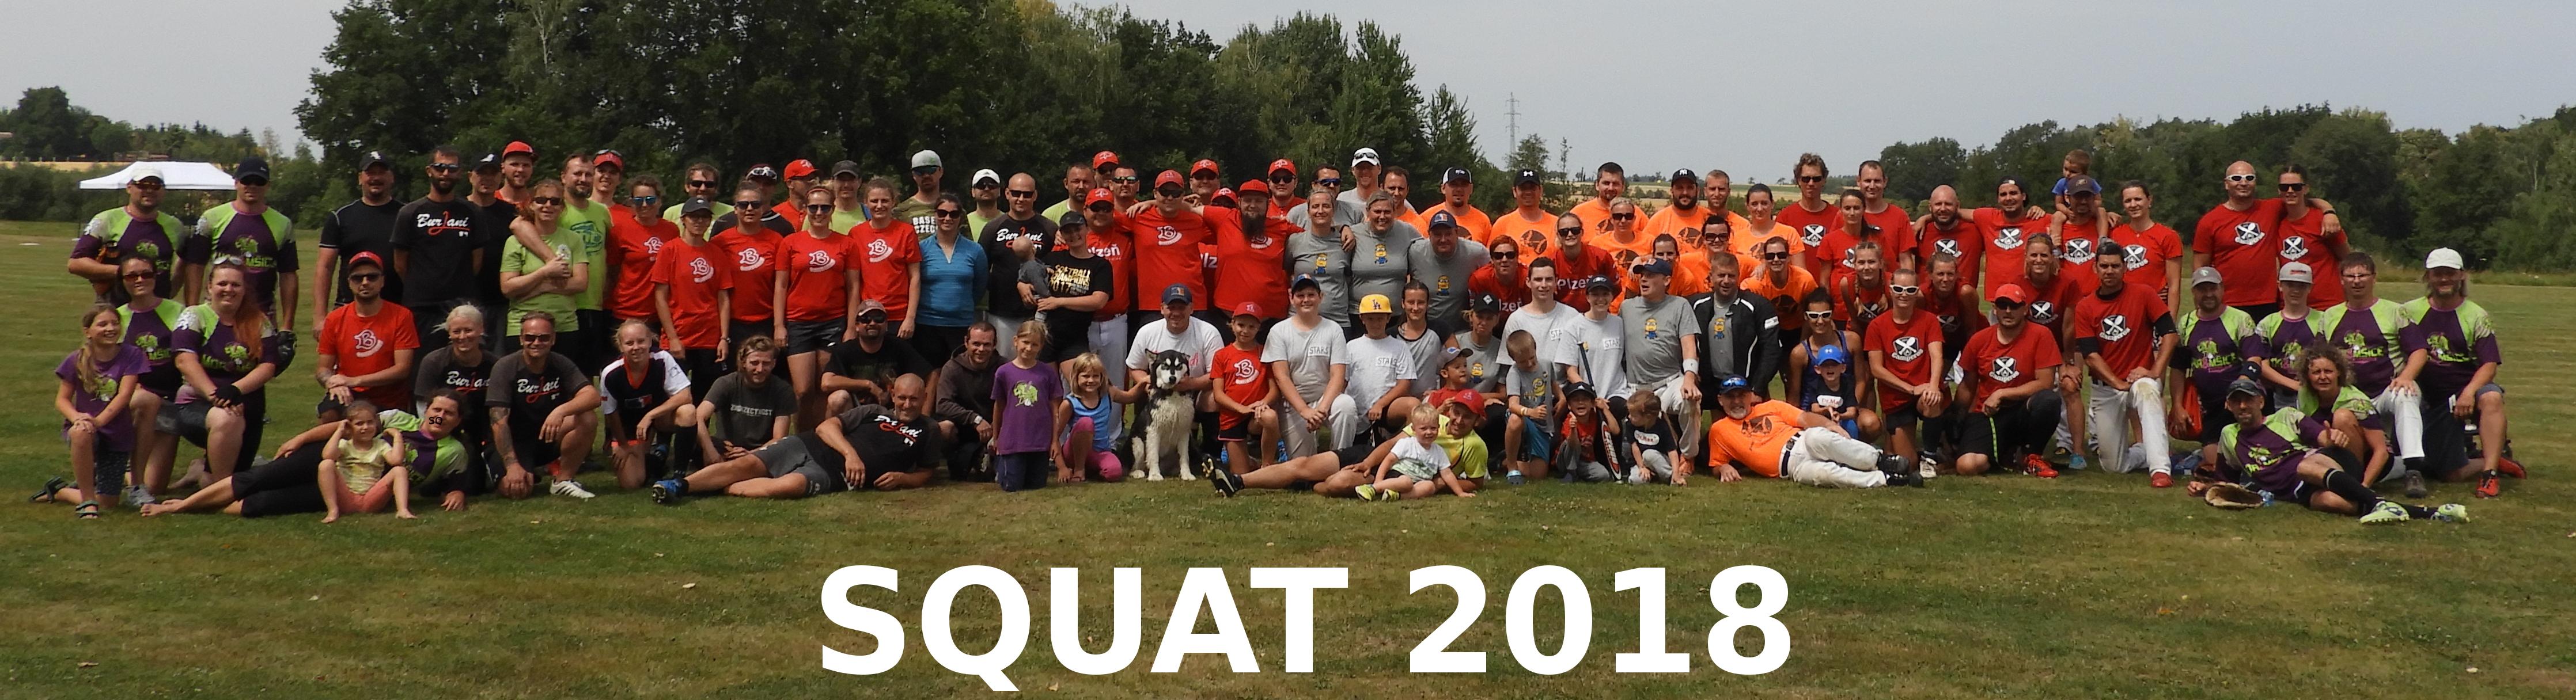 Squat 2018   fototo wayne